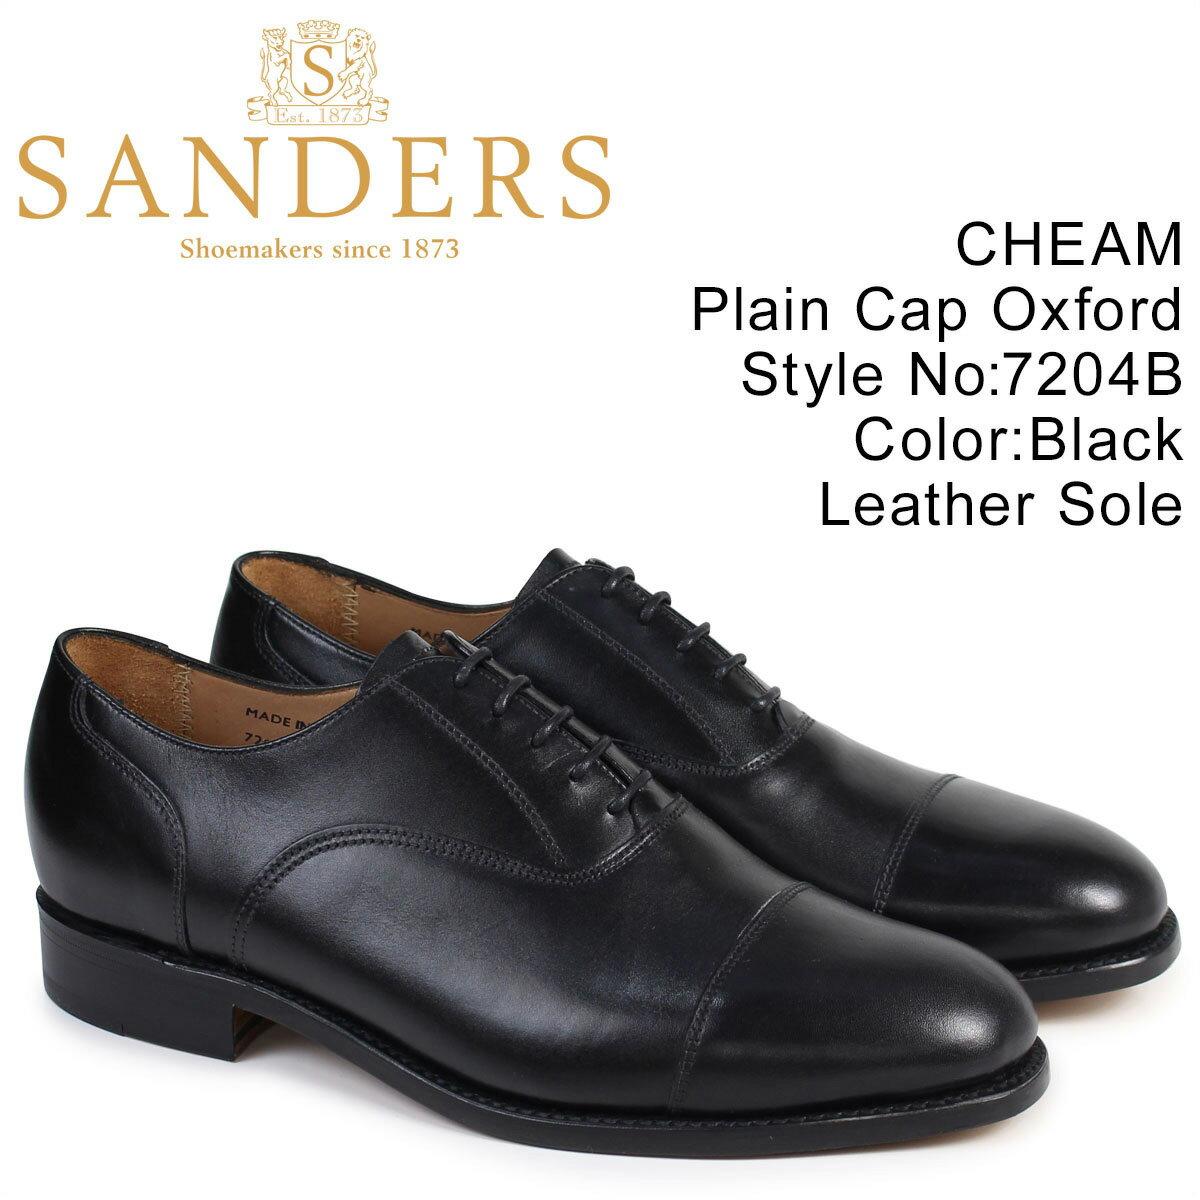 SANDERS CHEAM サンダース 靴 ミリタリー オックスフォード シューズ ビジネス 7204B メンズ ブラック [183]